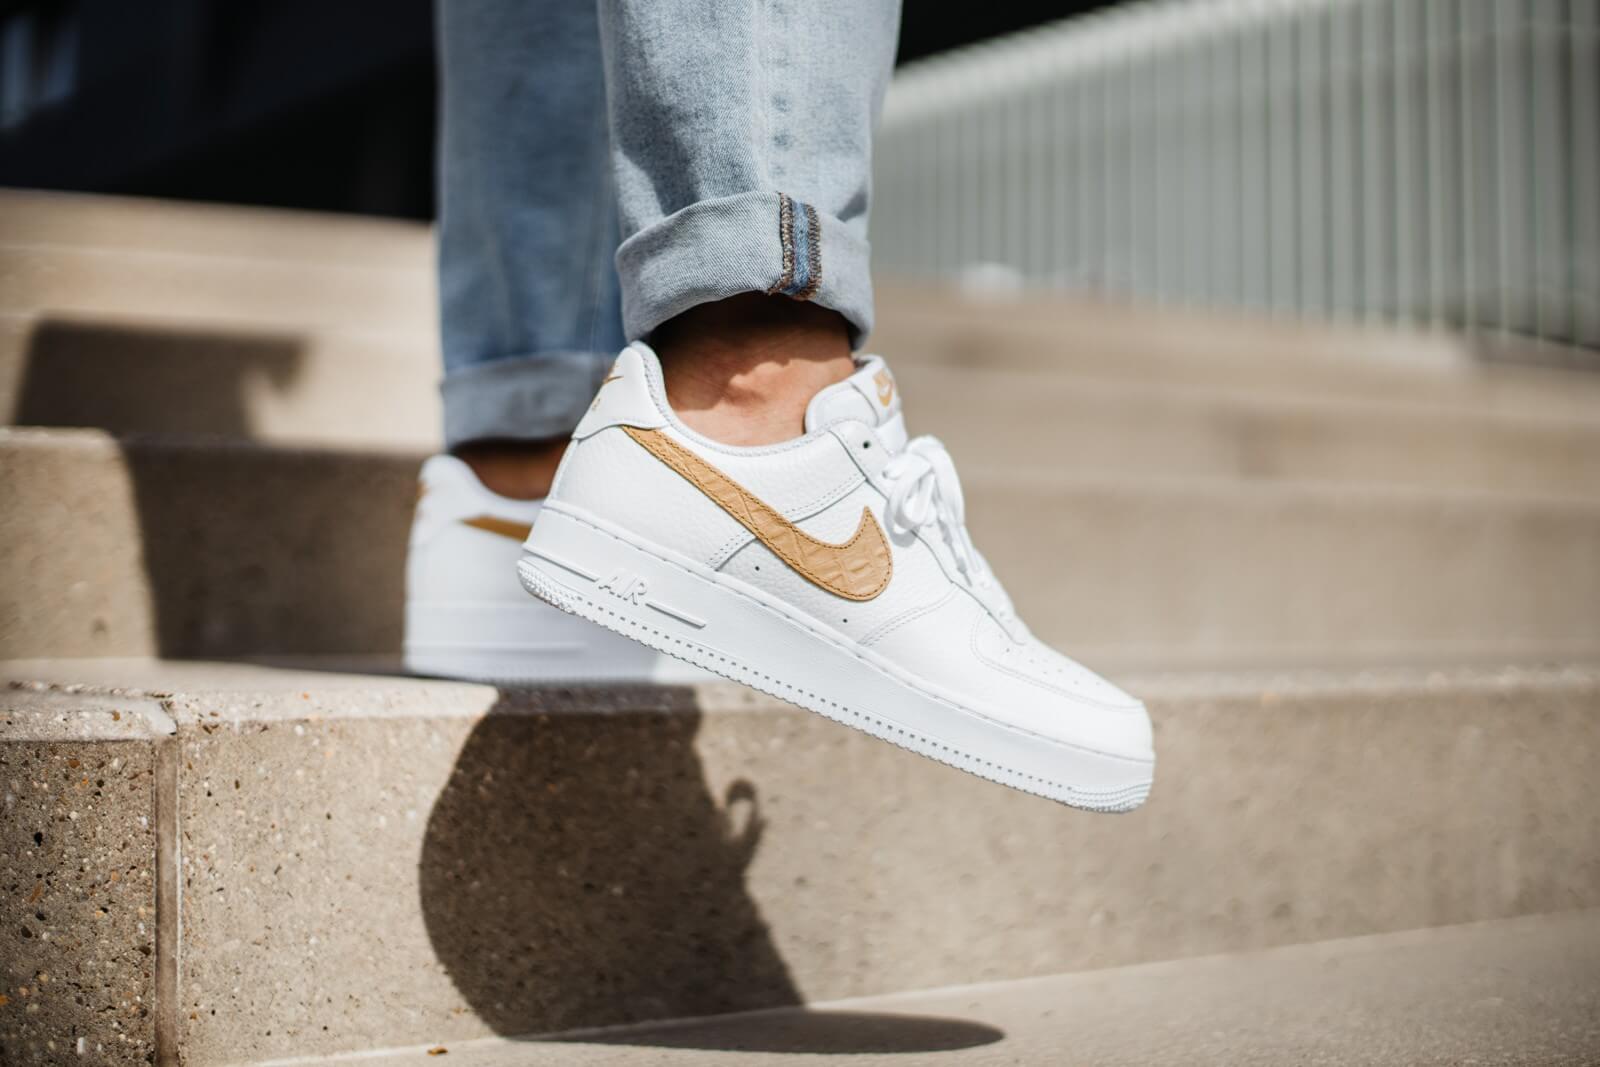 Nike Air Force 1 LV8 Pony Swoosh White/Club Gold